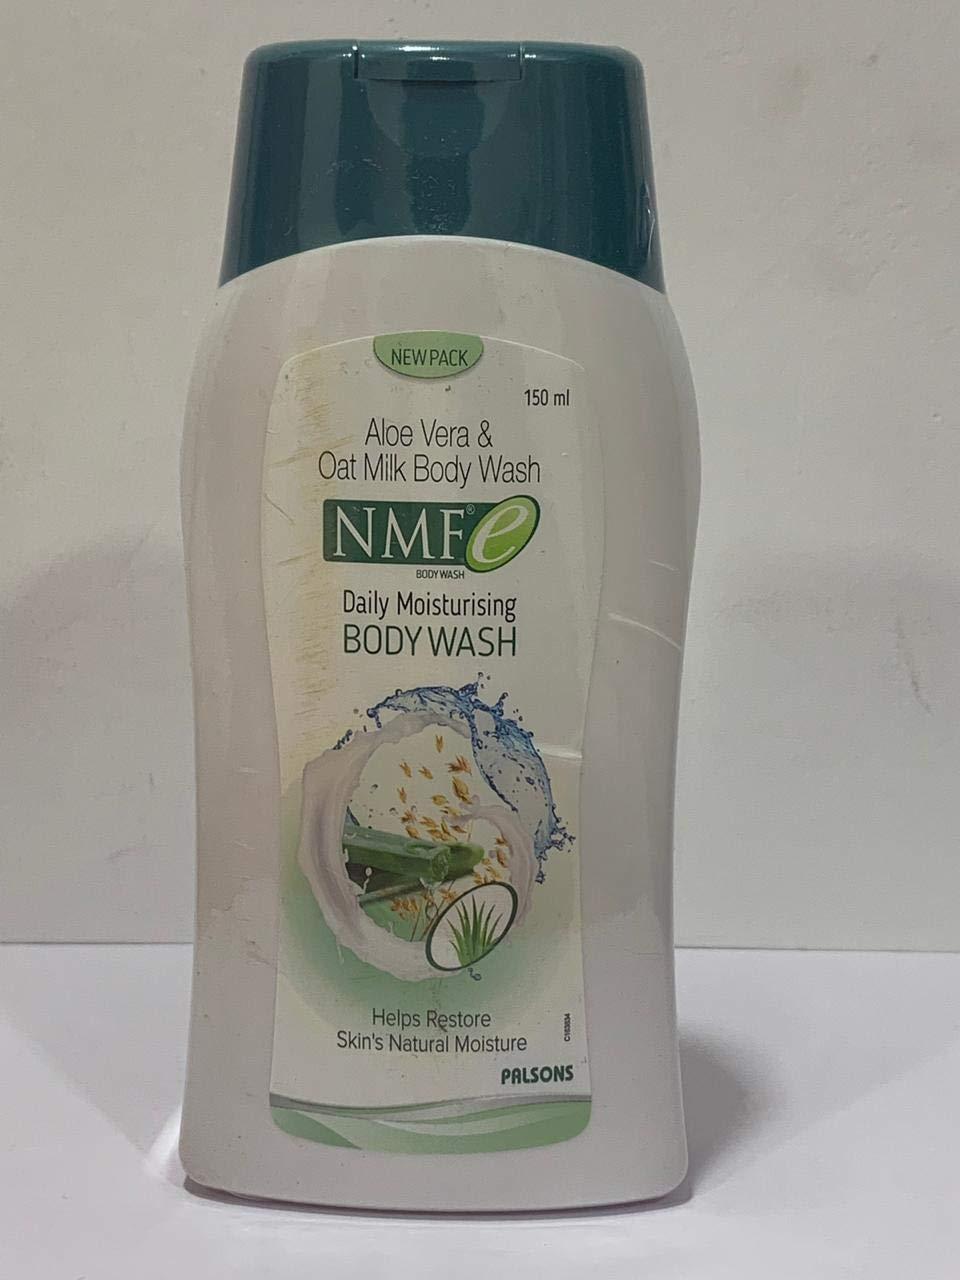 Nmf e daily moisturising   Body wash 150ml